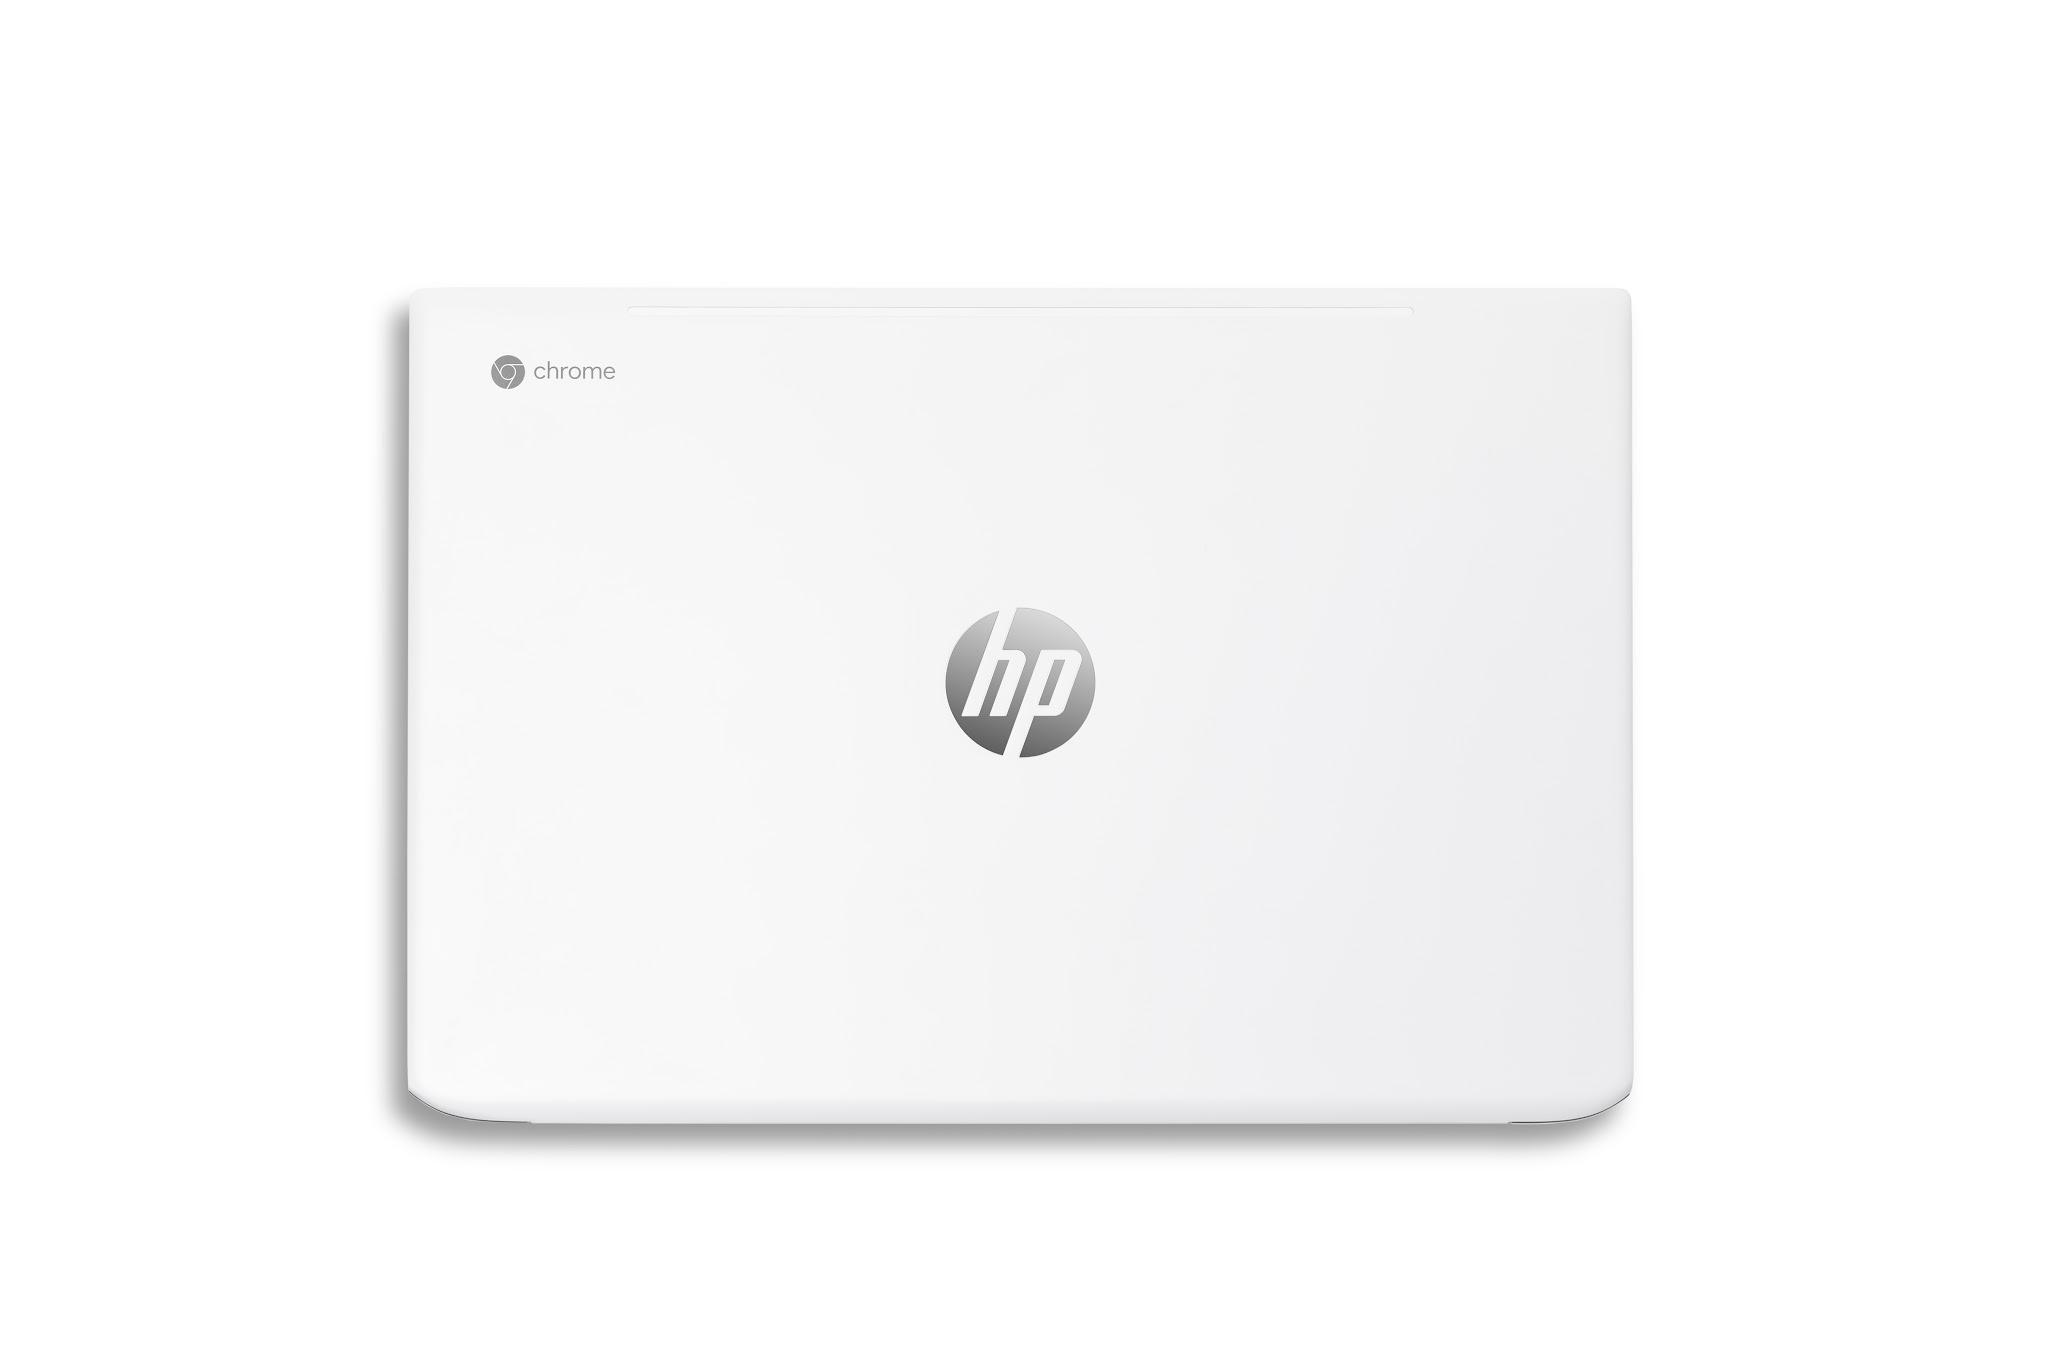 HP Chromebook 15 - photo 12